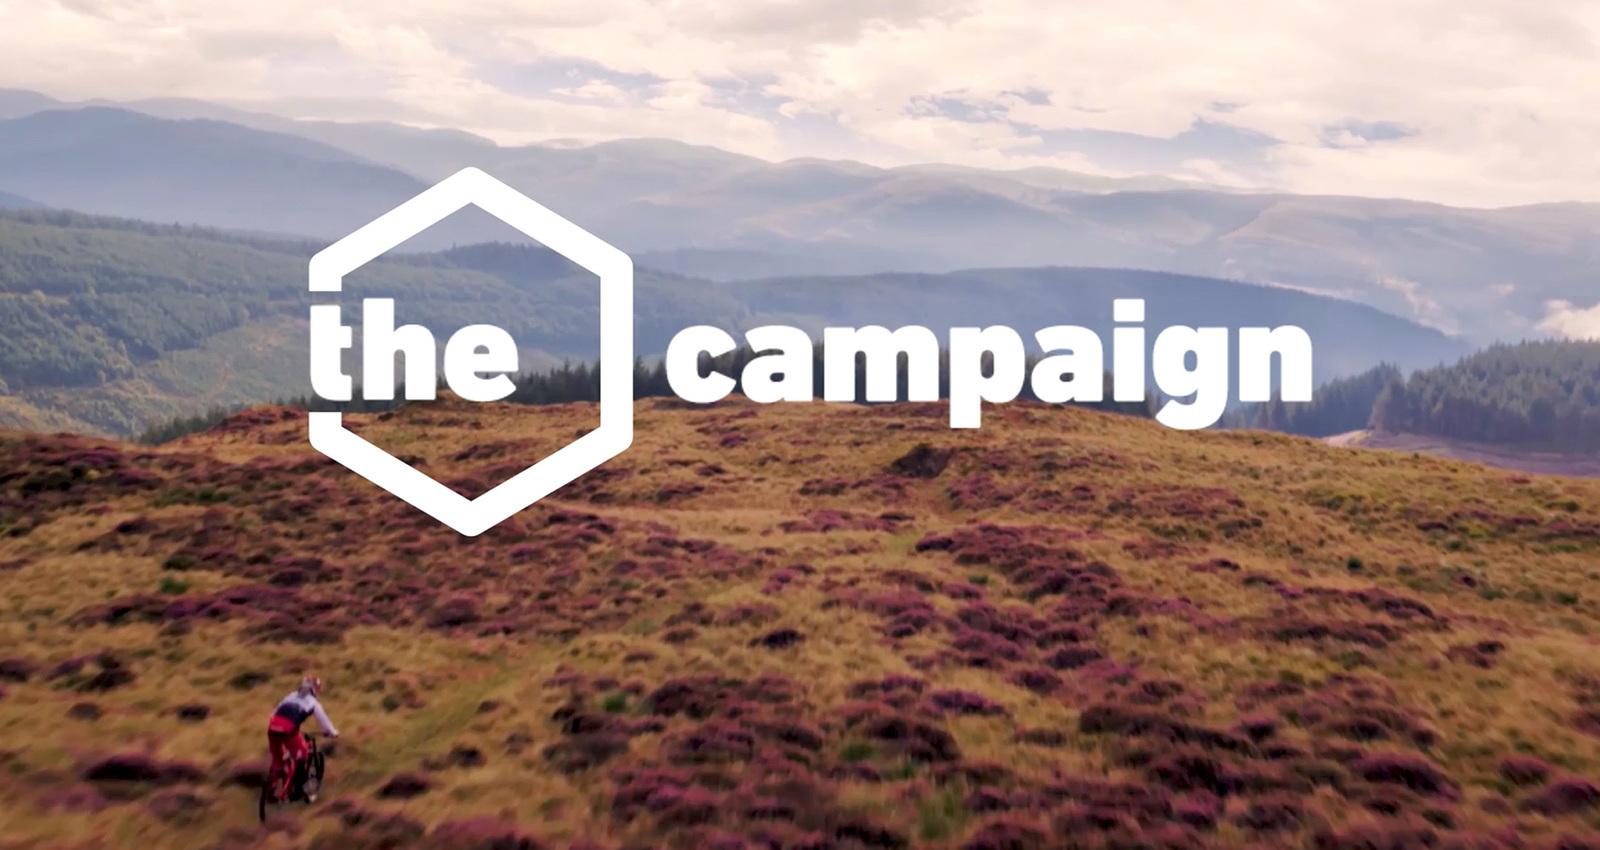 The O Campaign